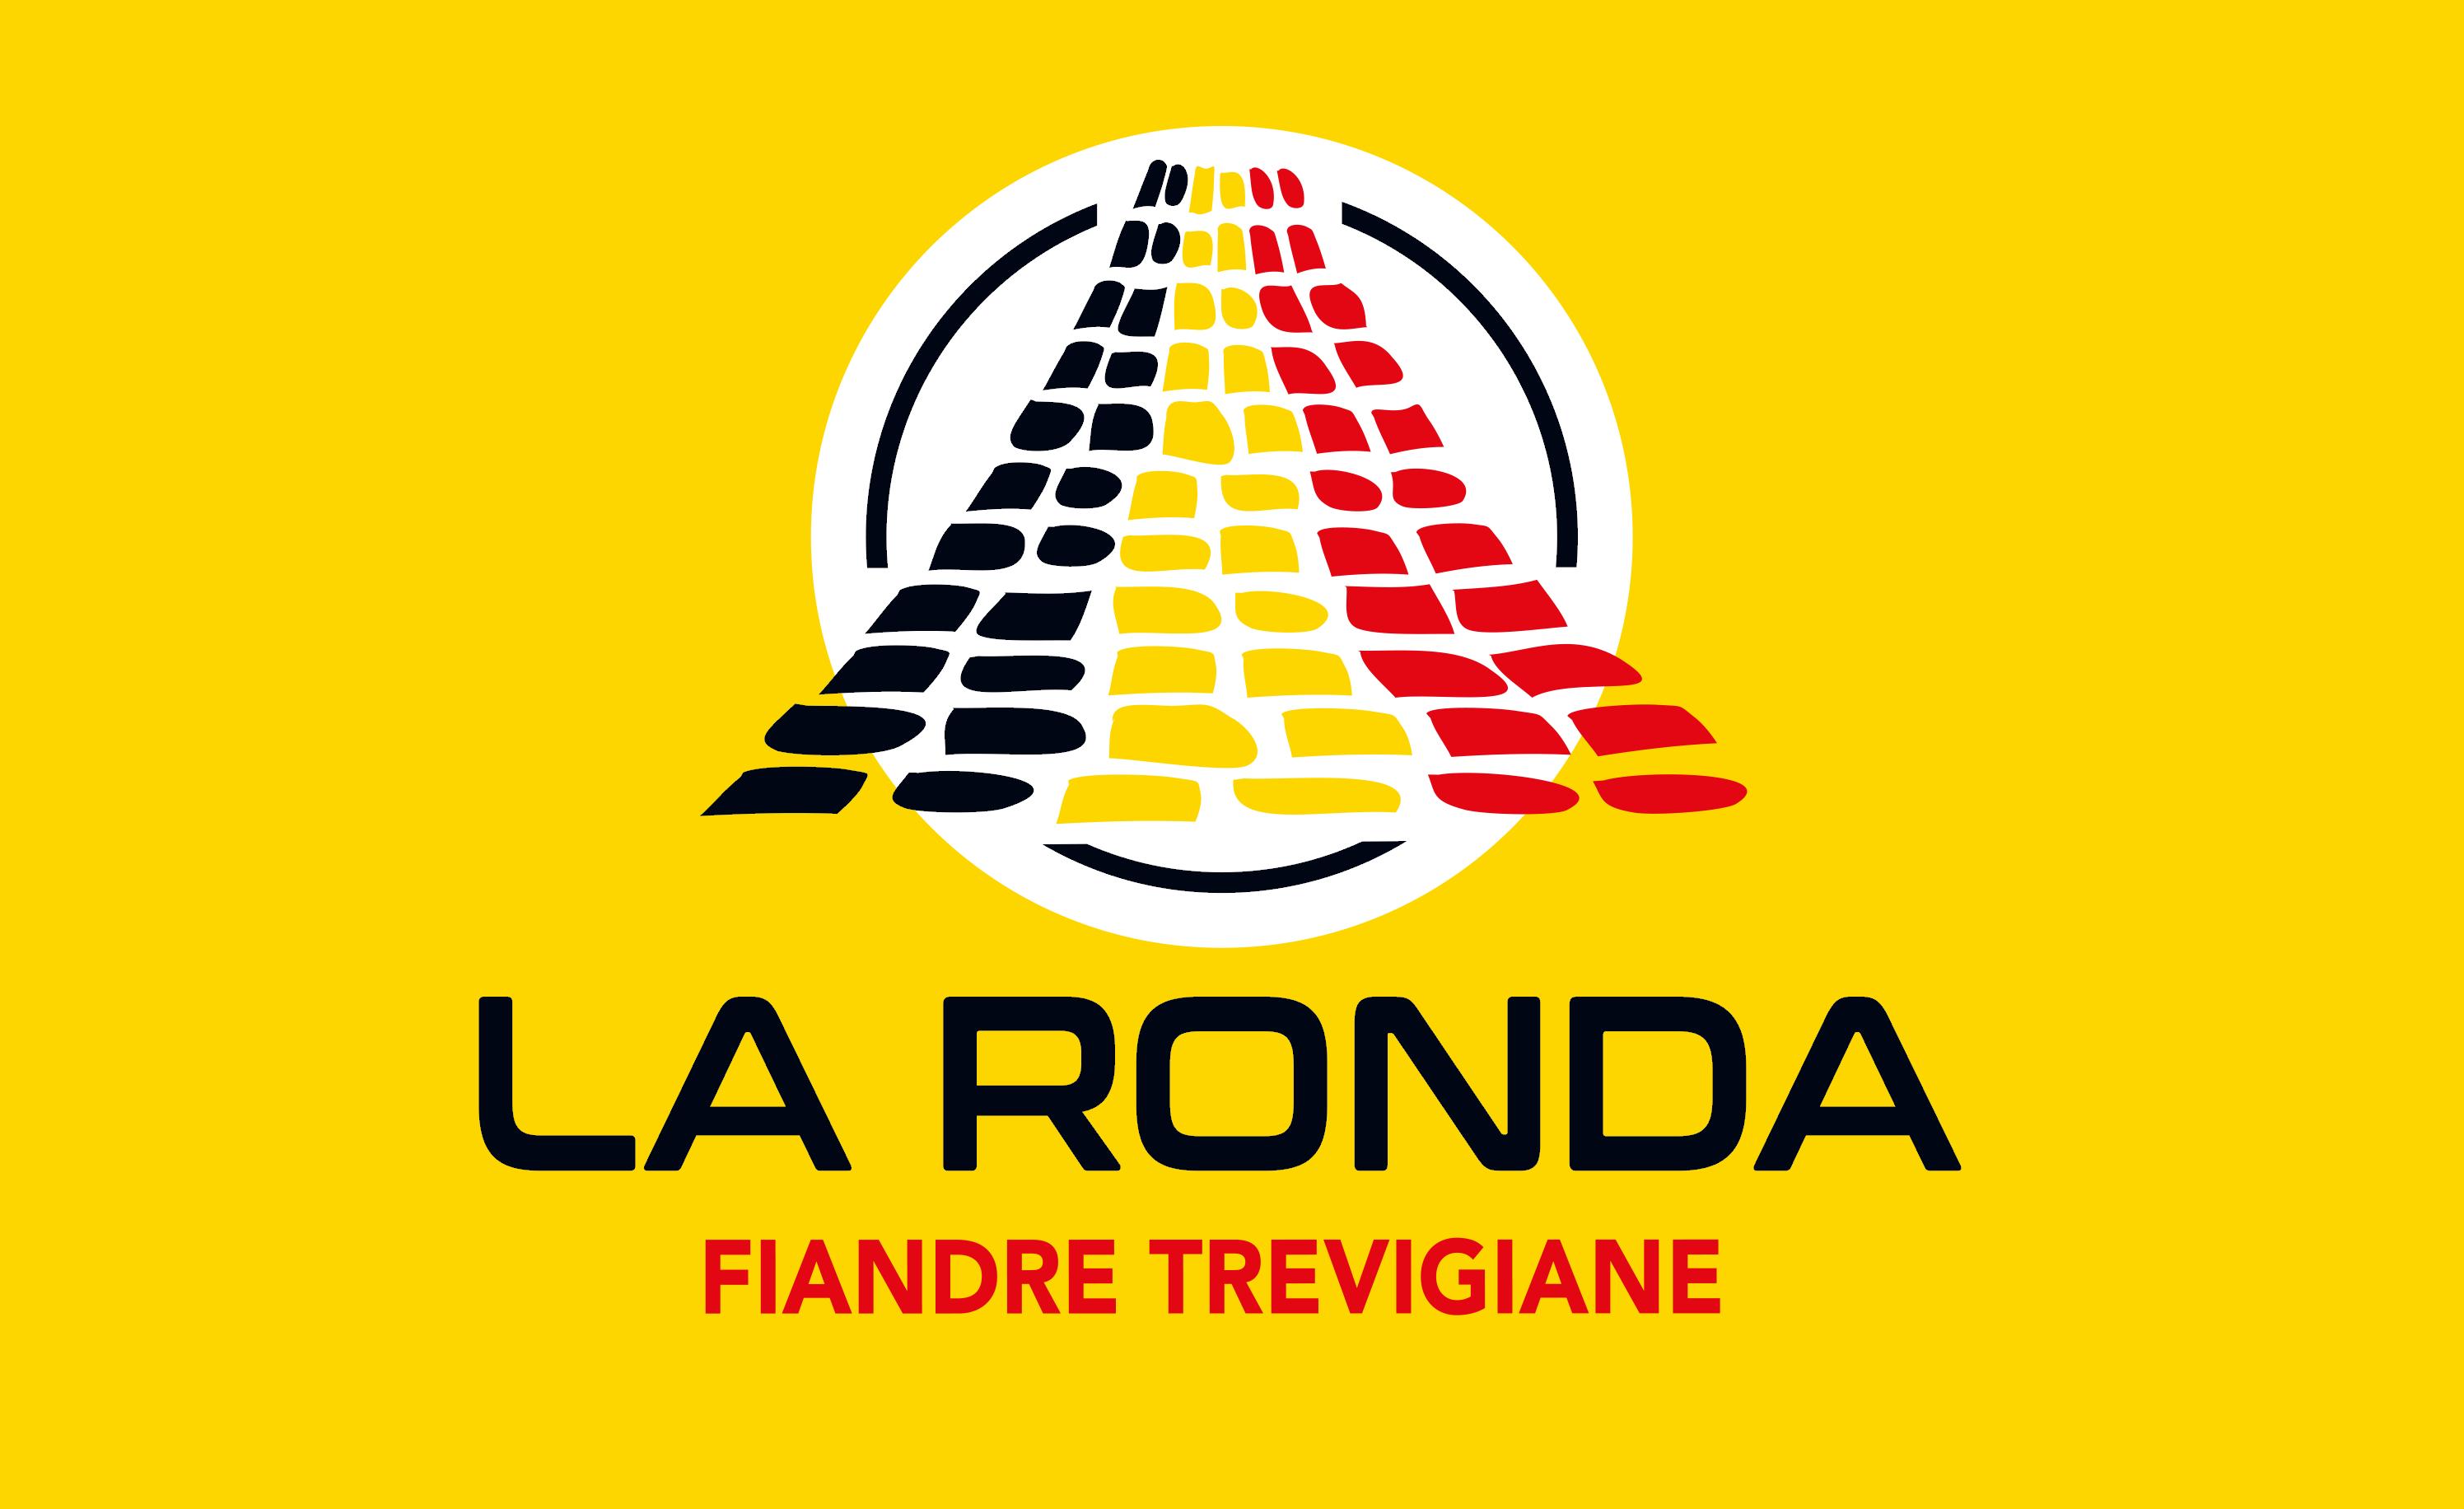 La Ronda le Fiandre trevigiane